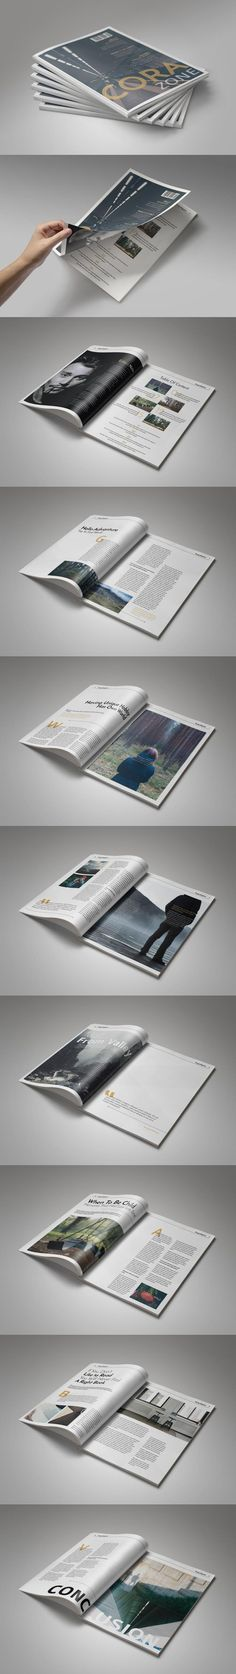 #magazine #design from Corazone   DOWNLOAD: https://creativemarket.com/Corazone/494482-Multipurpose-Magazine-Vol.-1?u=zsoltczigler